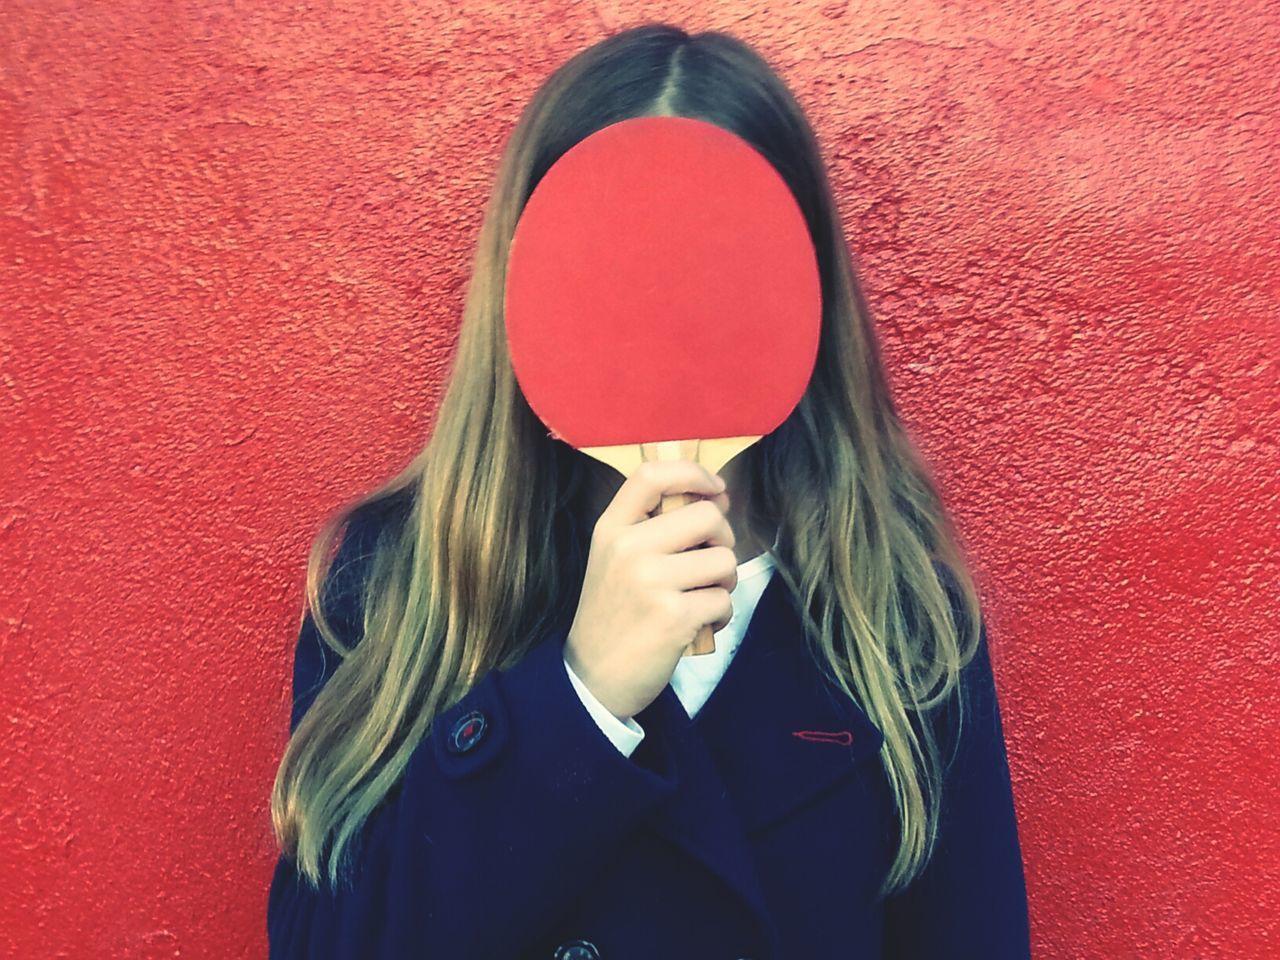 Teenage Girl Holding Table Tennis Racket